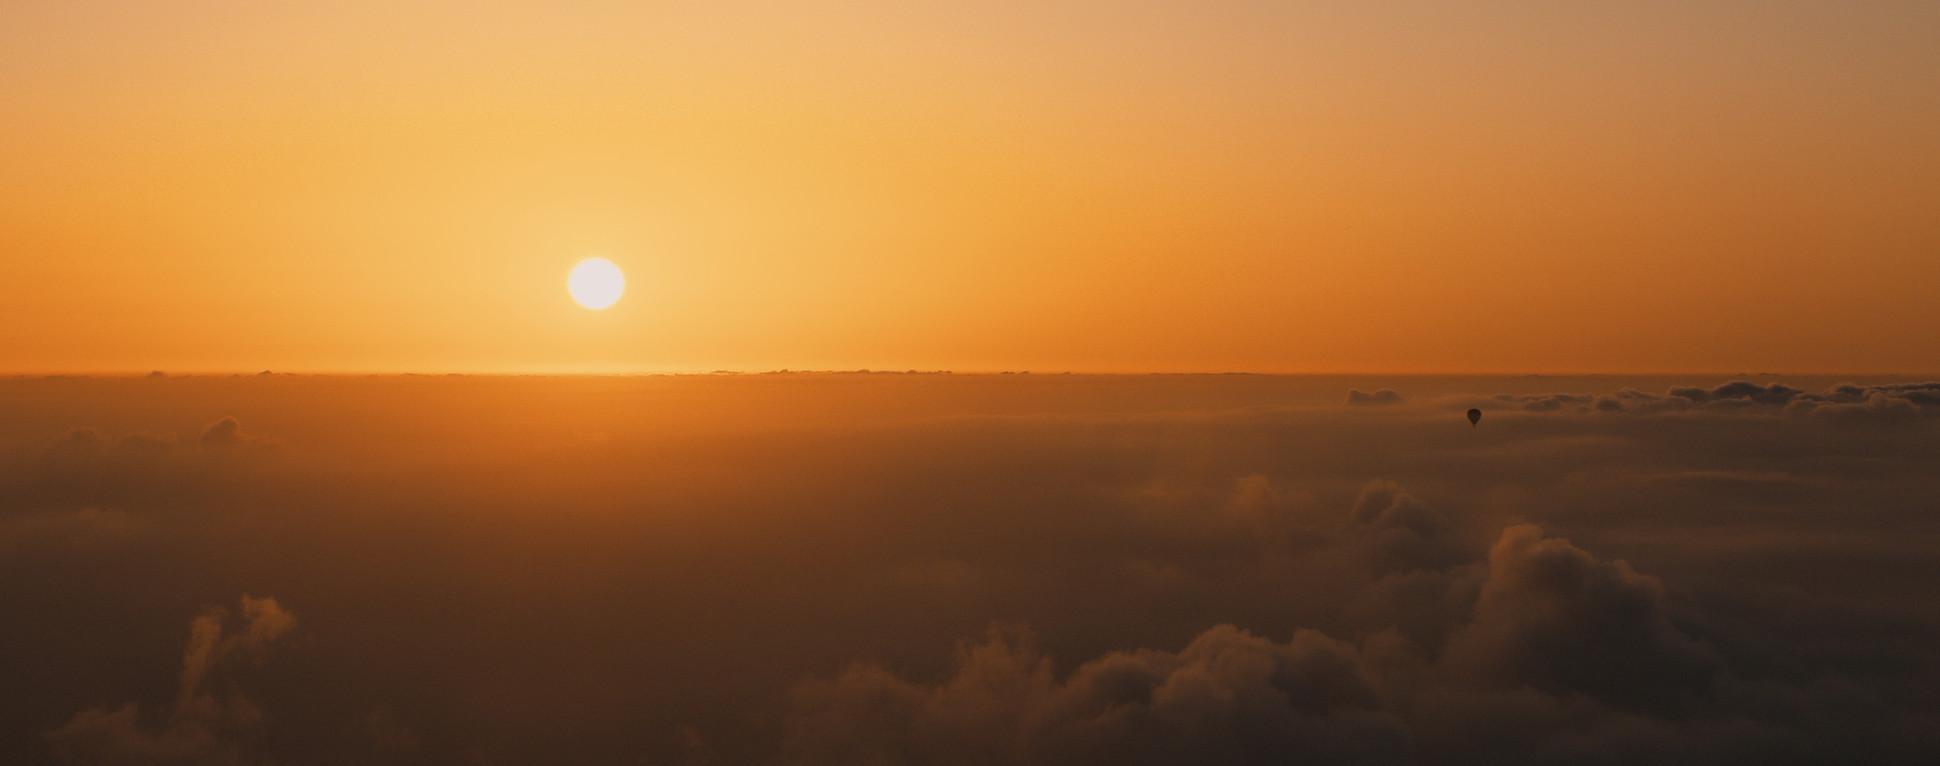 Jetman Sunrise_1.7.1_1.7.1.jpg